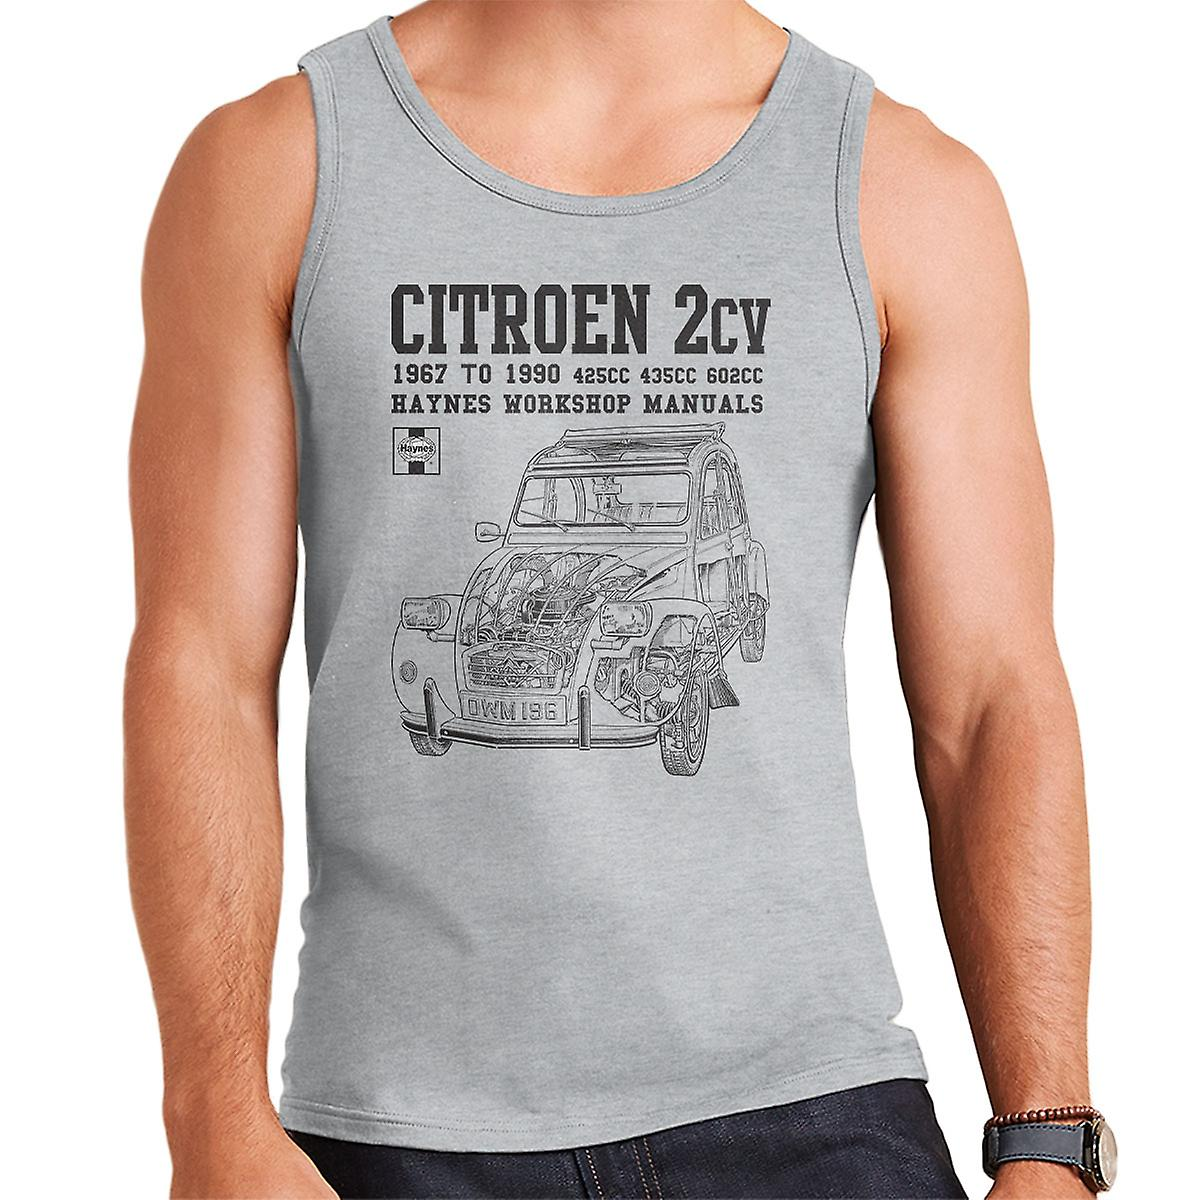 Haynes eiere Workshop manuell Citroen 2CV svart menn Vest